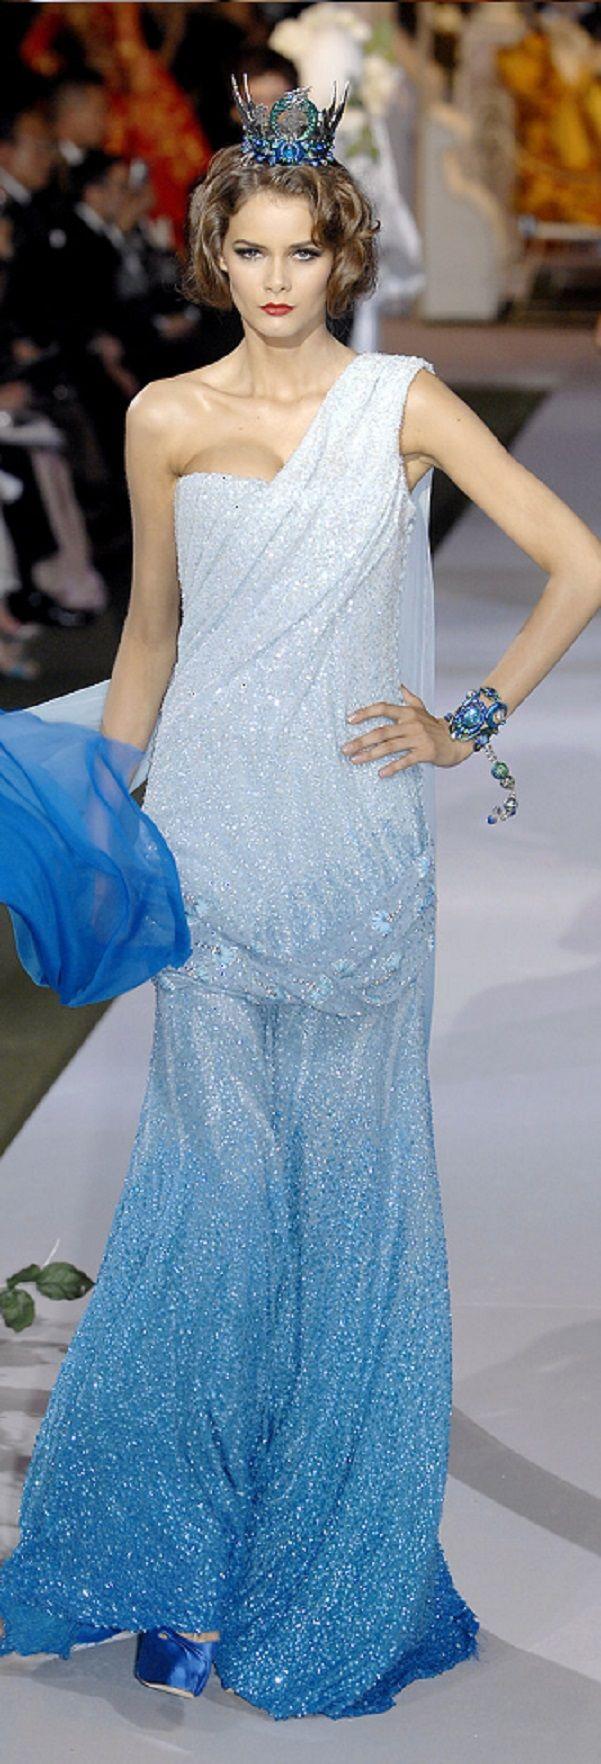 Christian Dior - Haute Couture fall 2007 -